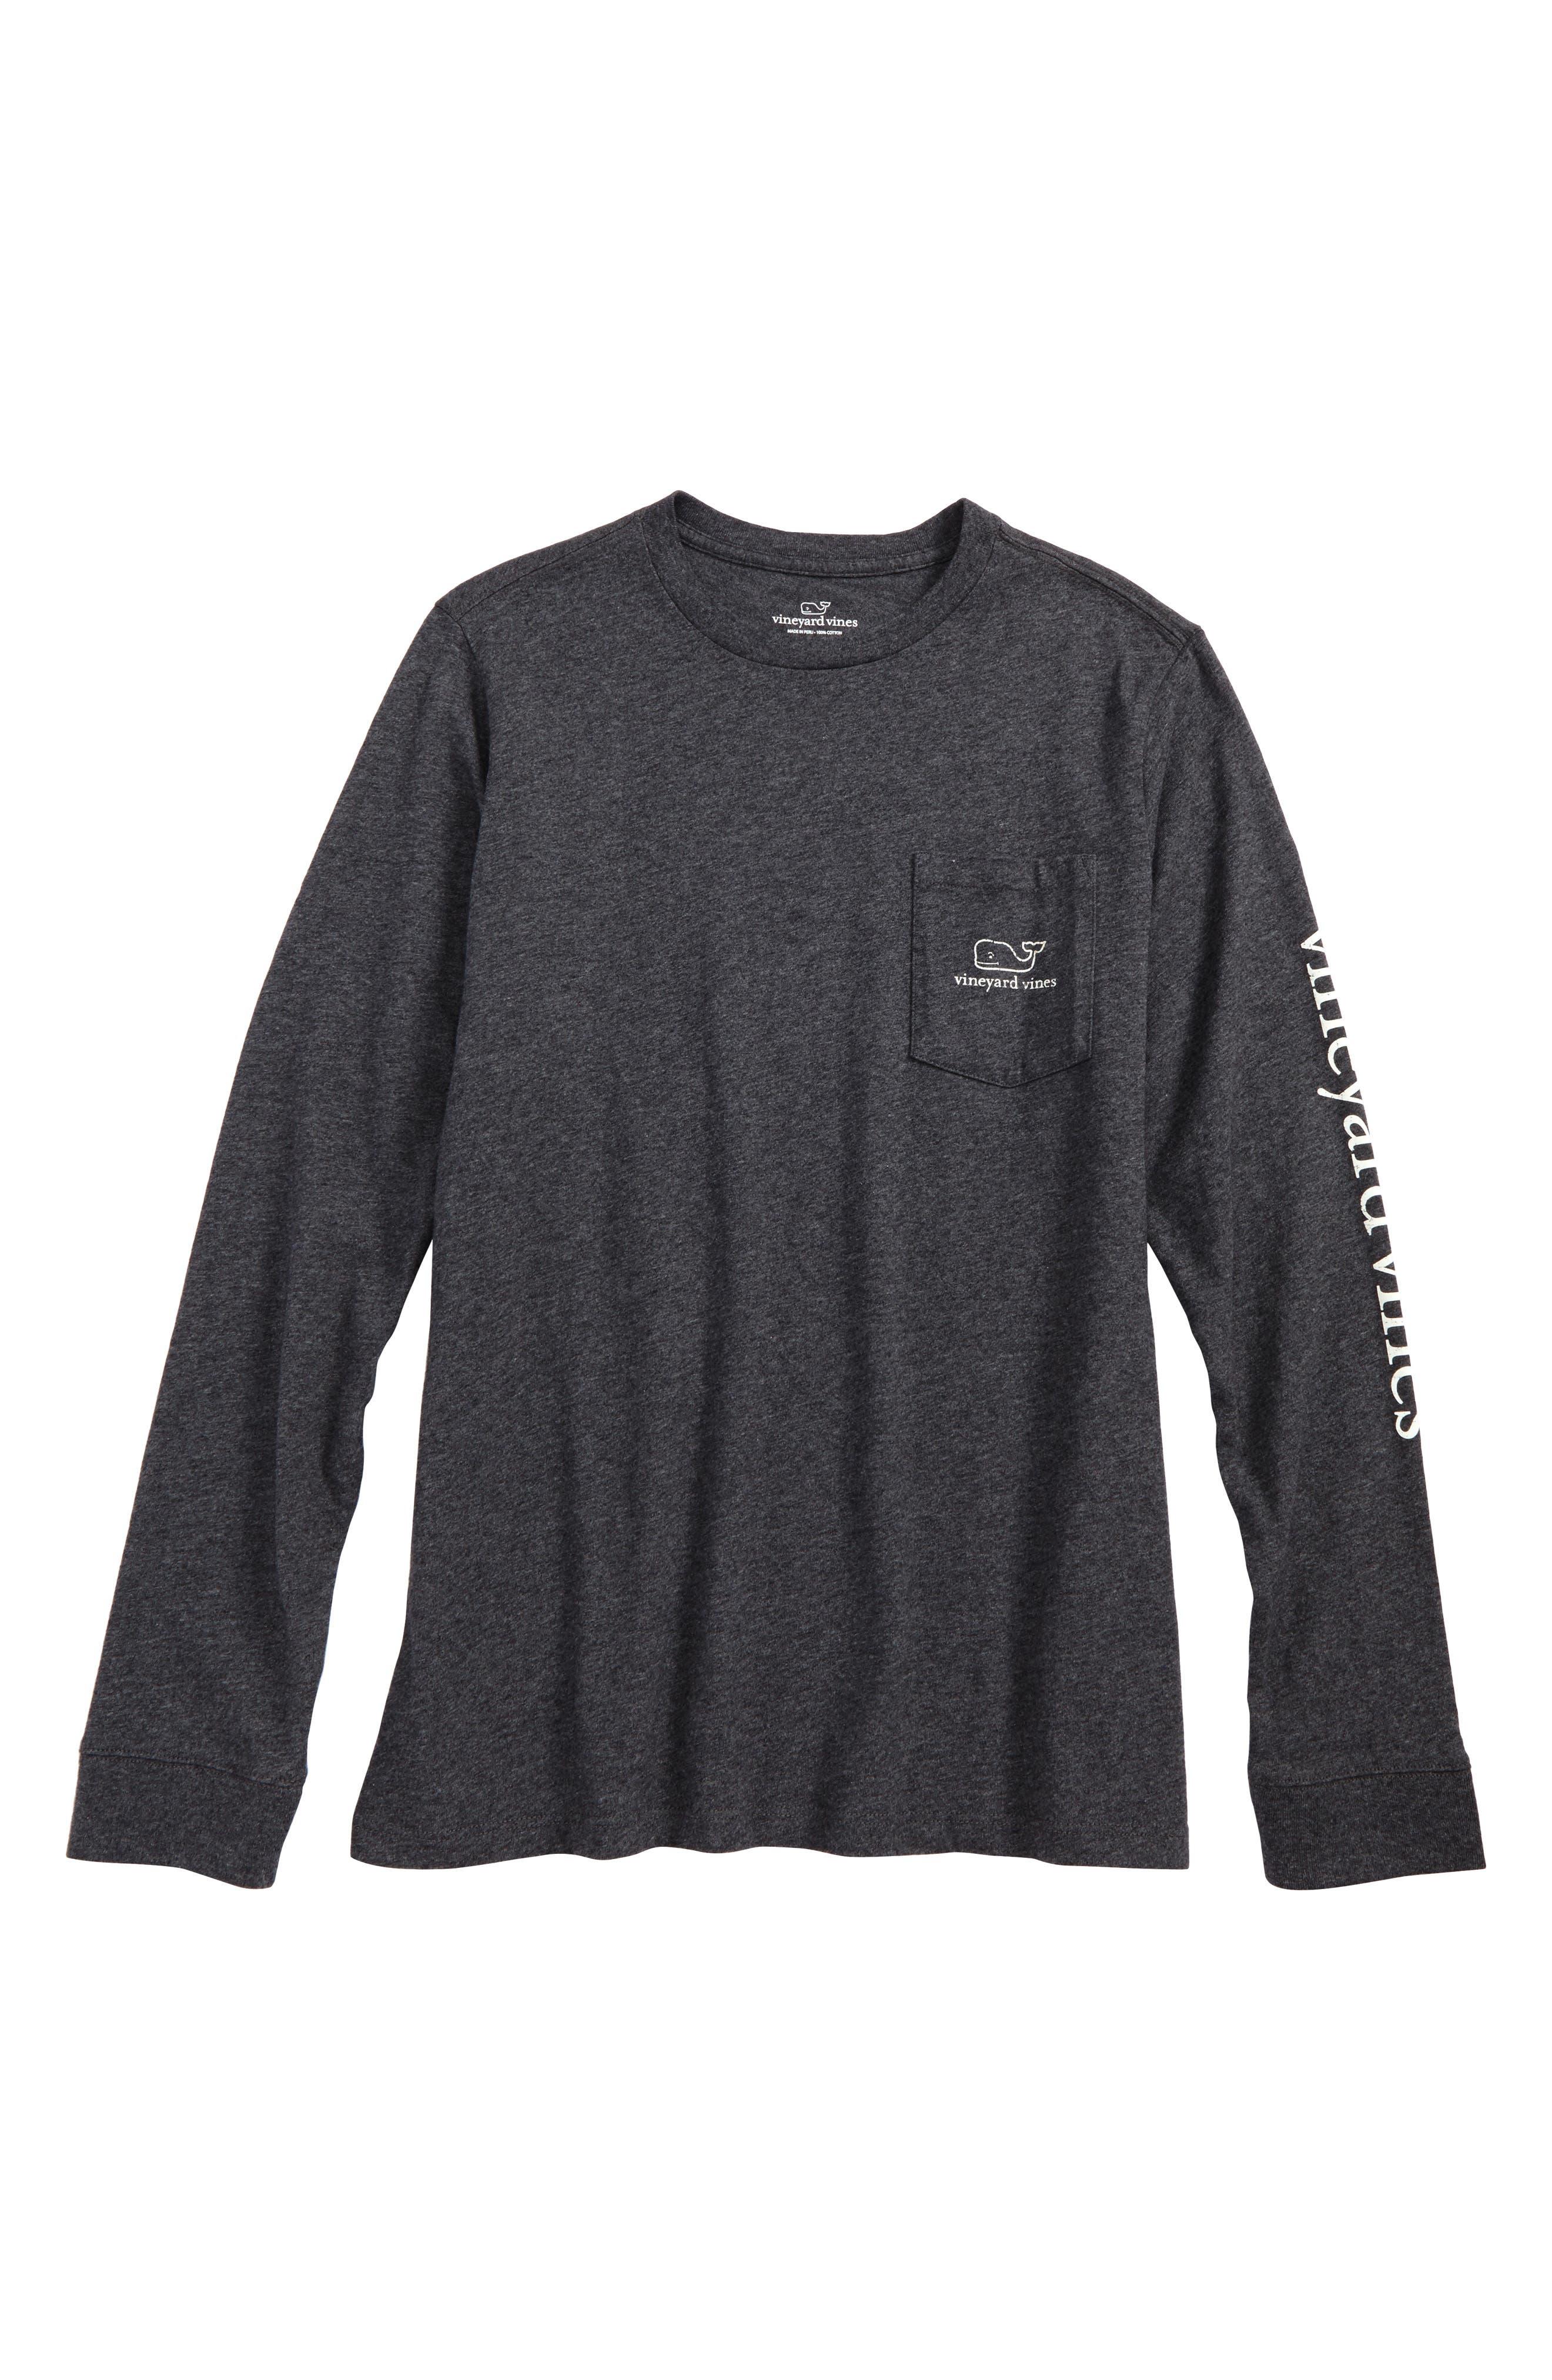 vineyard vines Glow in the Dark Vintage Whale Pocket T-Shirt (Big Boys)